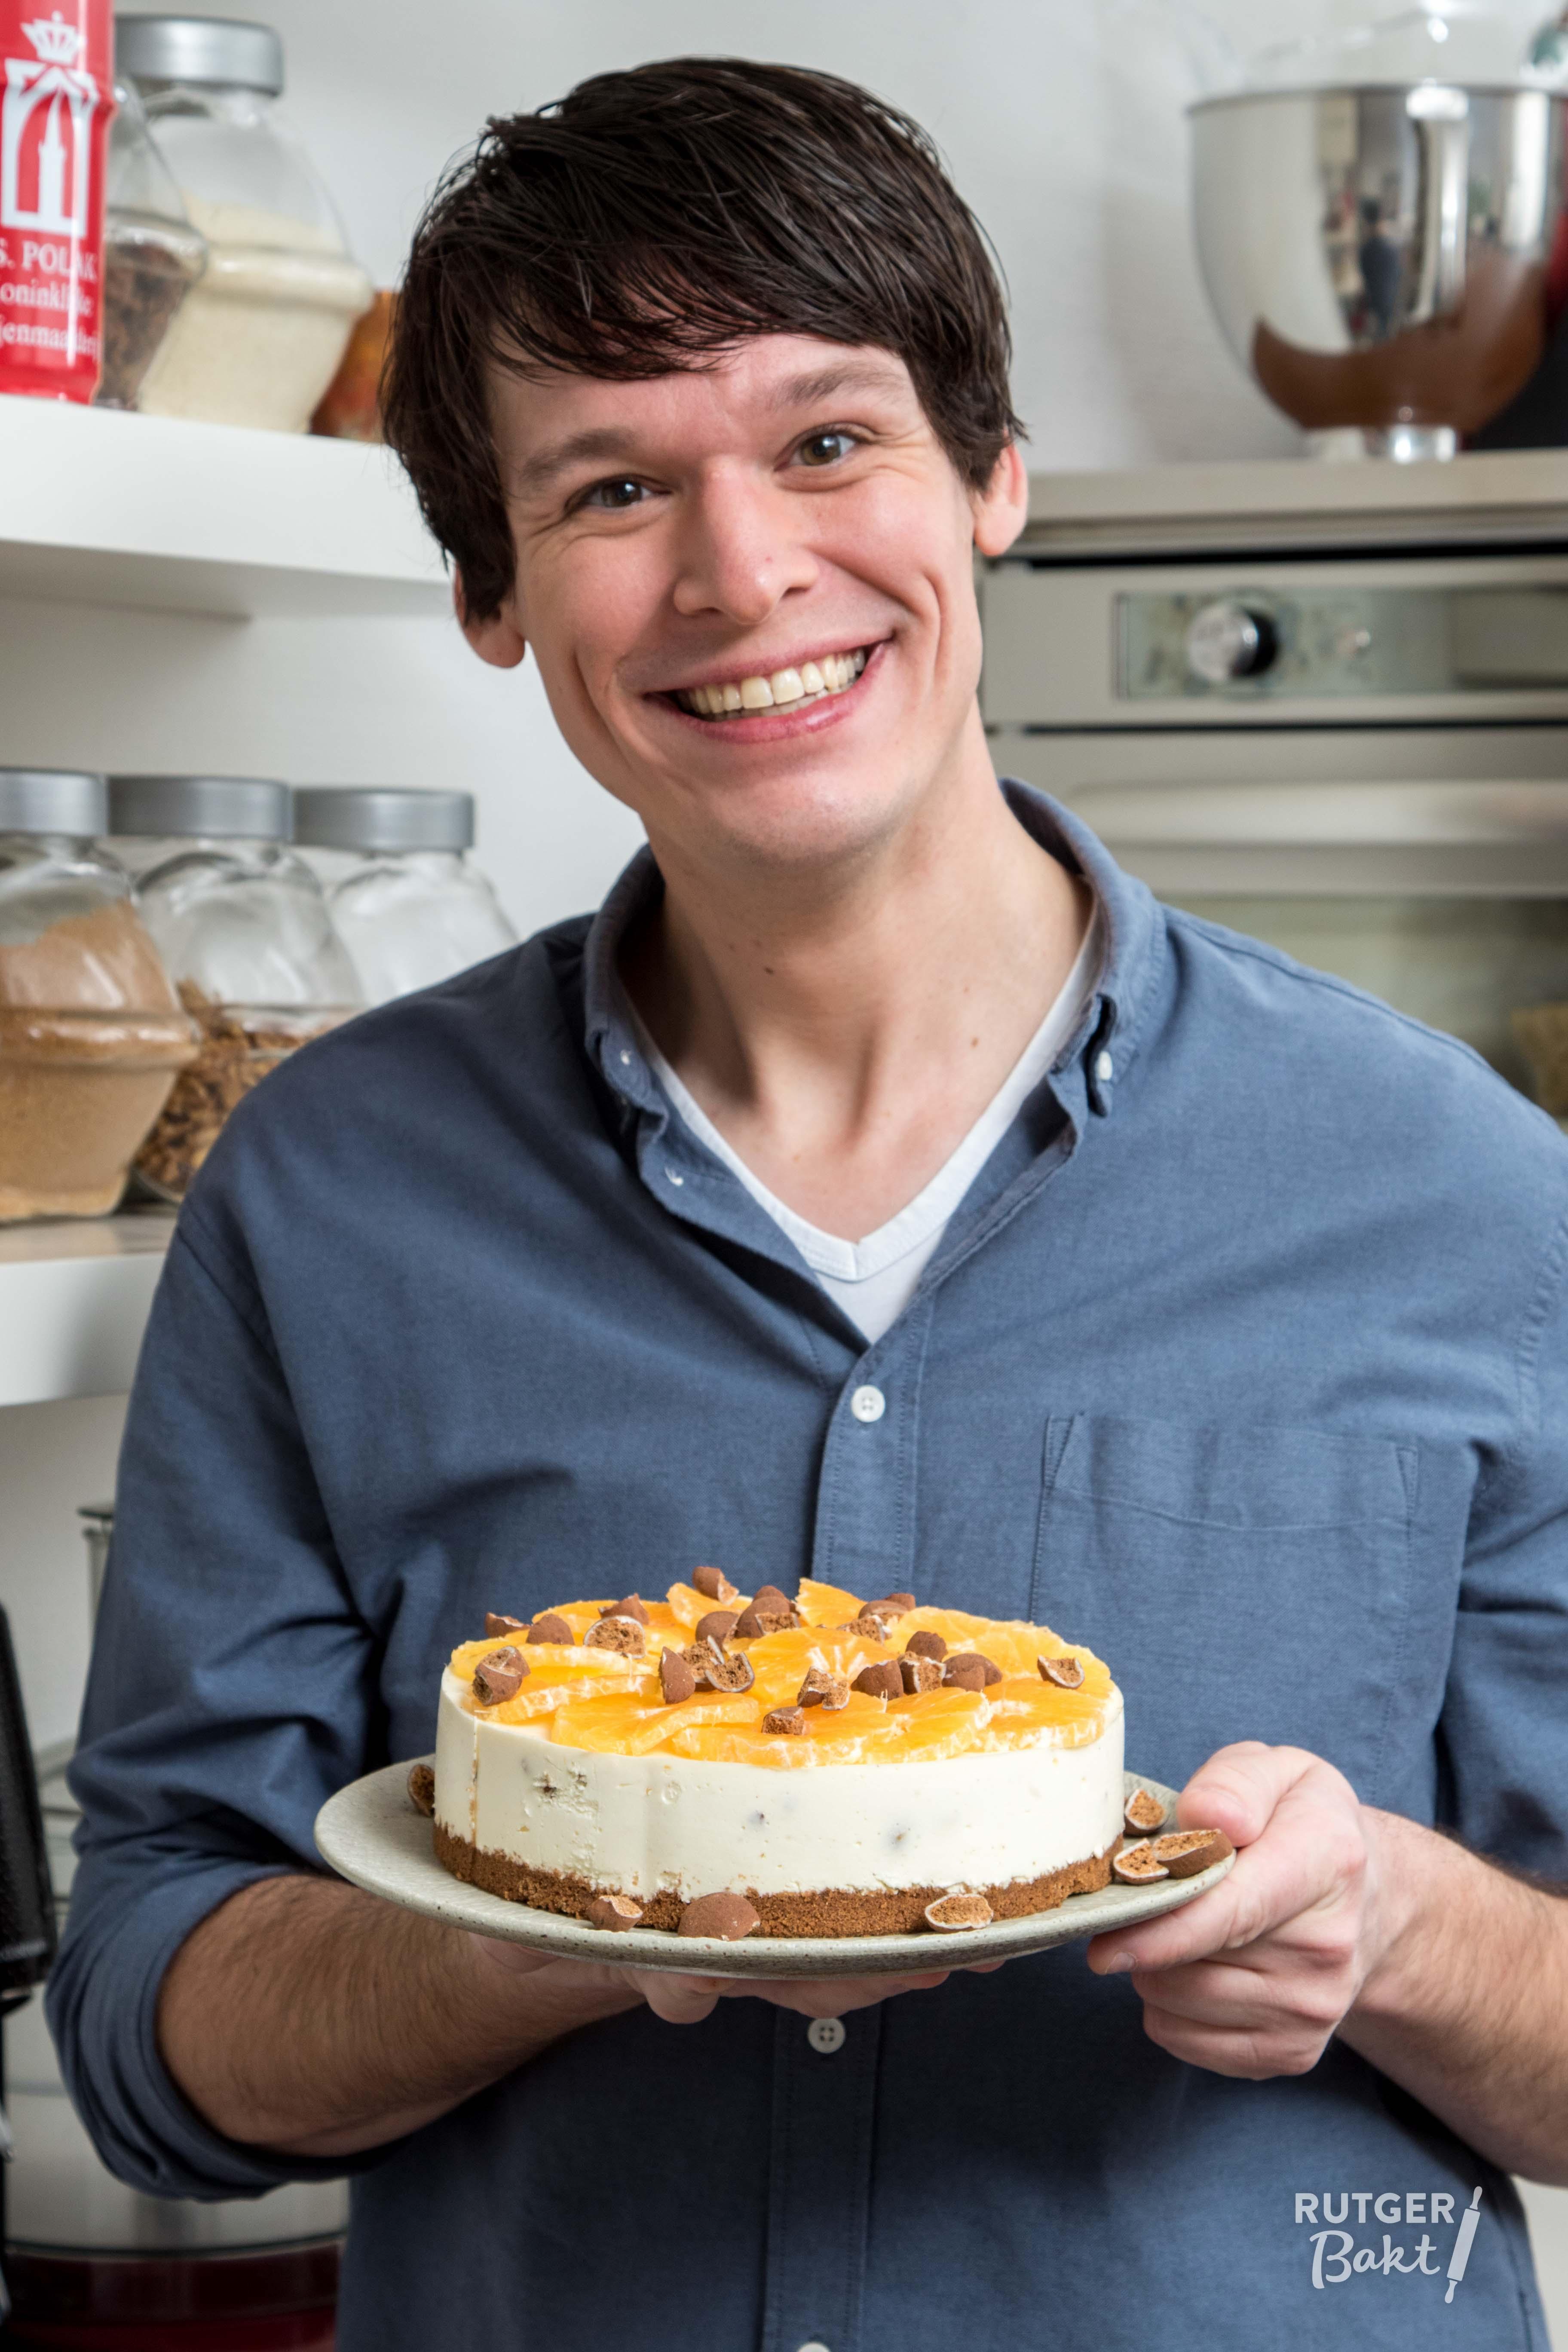 No-bake Philaldelphia cheesecake met kruidnoten en mandarijn